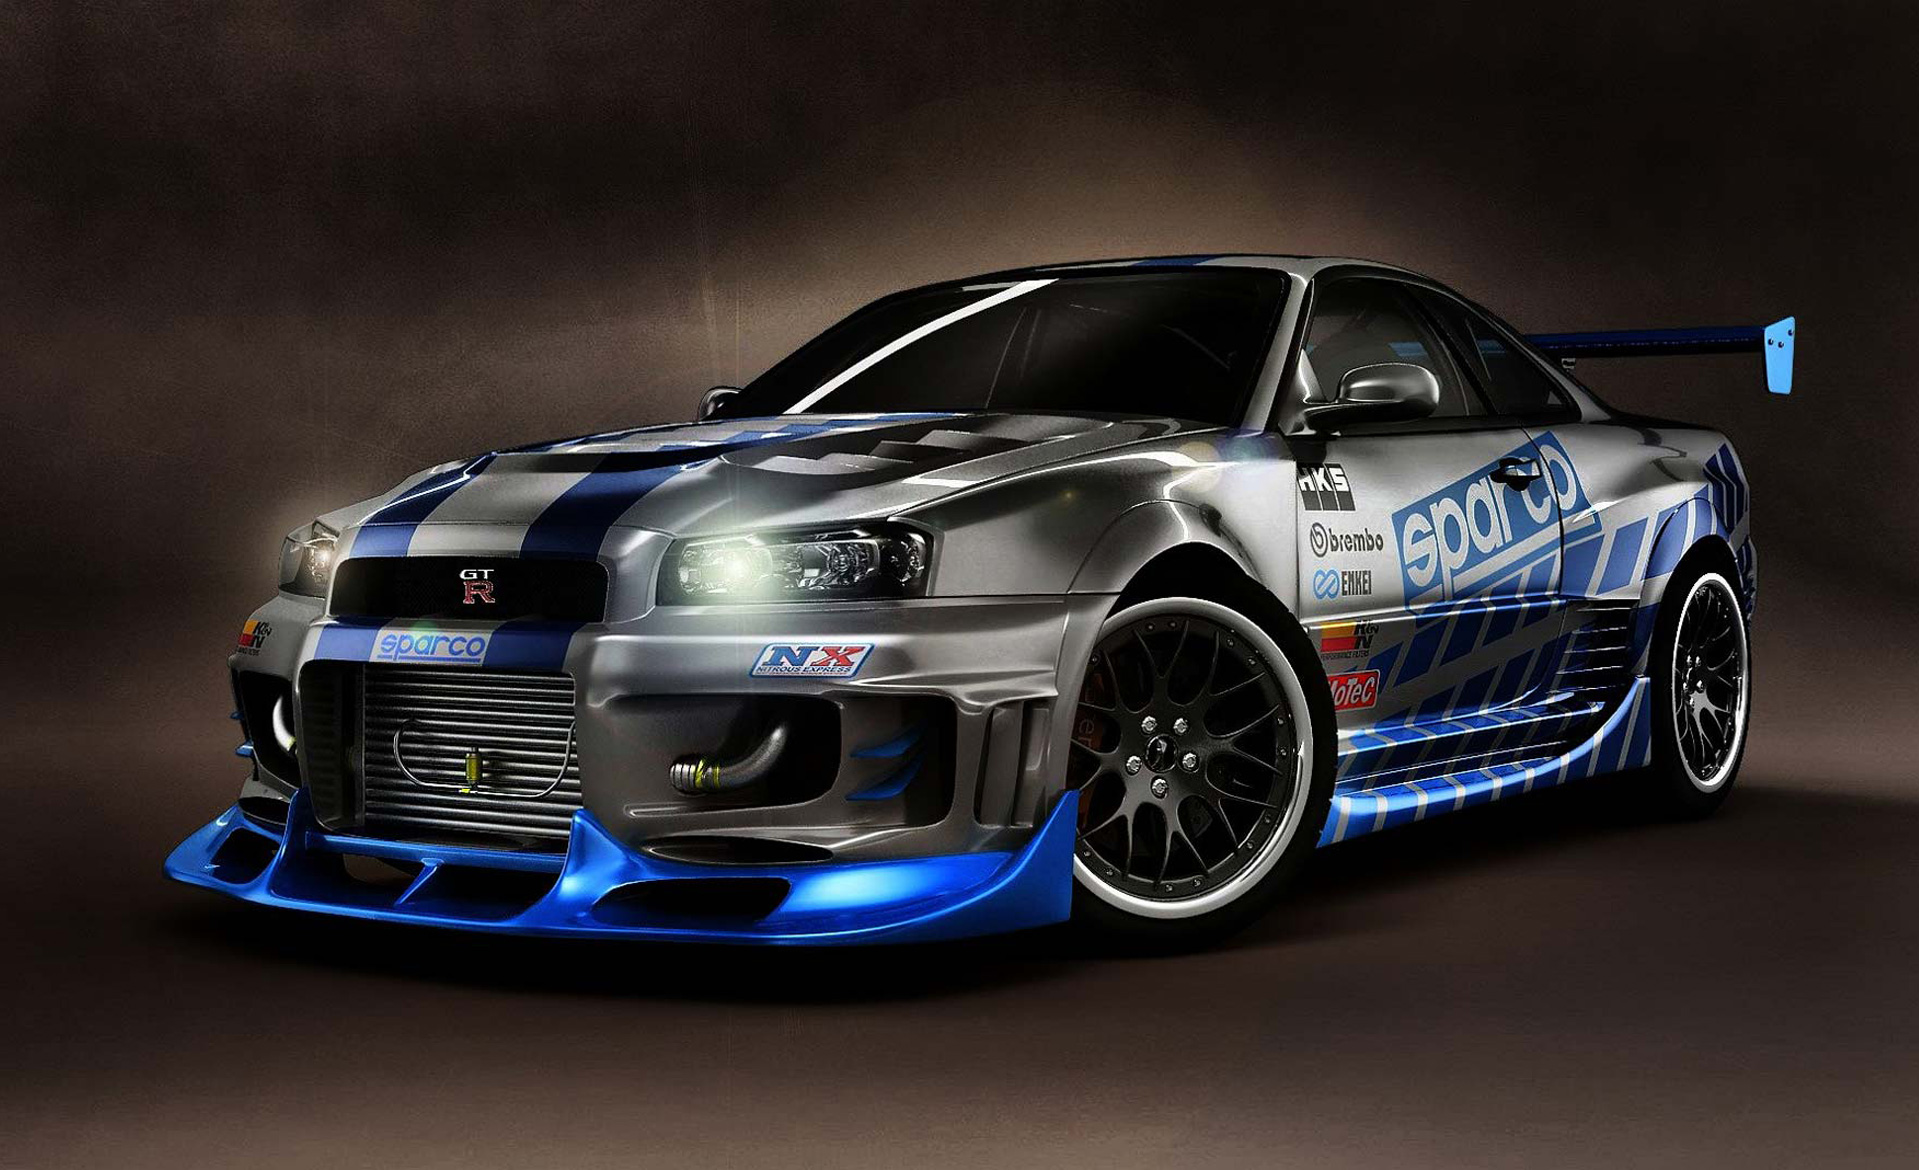 Nissan Gtr Fast And Furious >> Tuning Wallpapers - WallpaperSafari